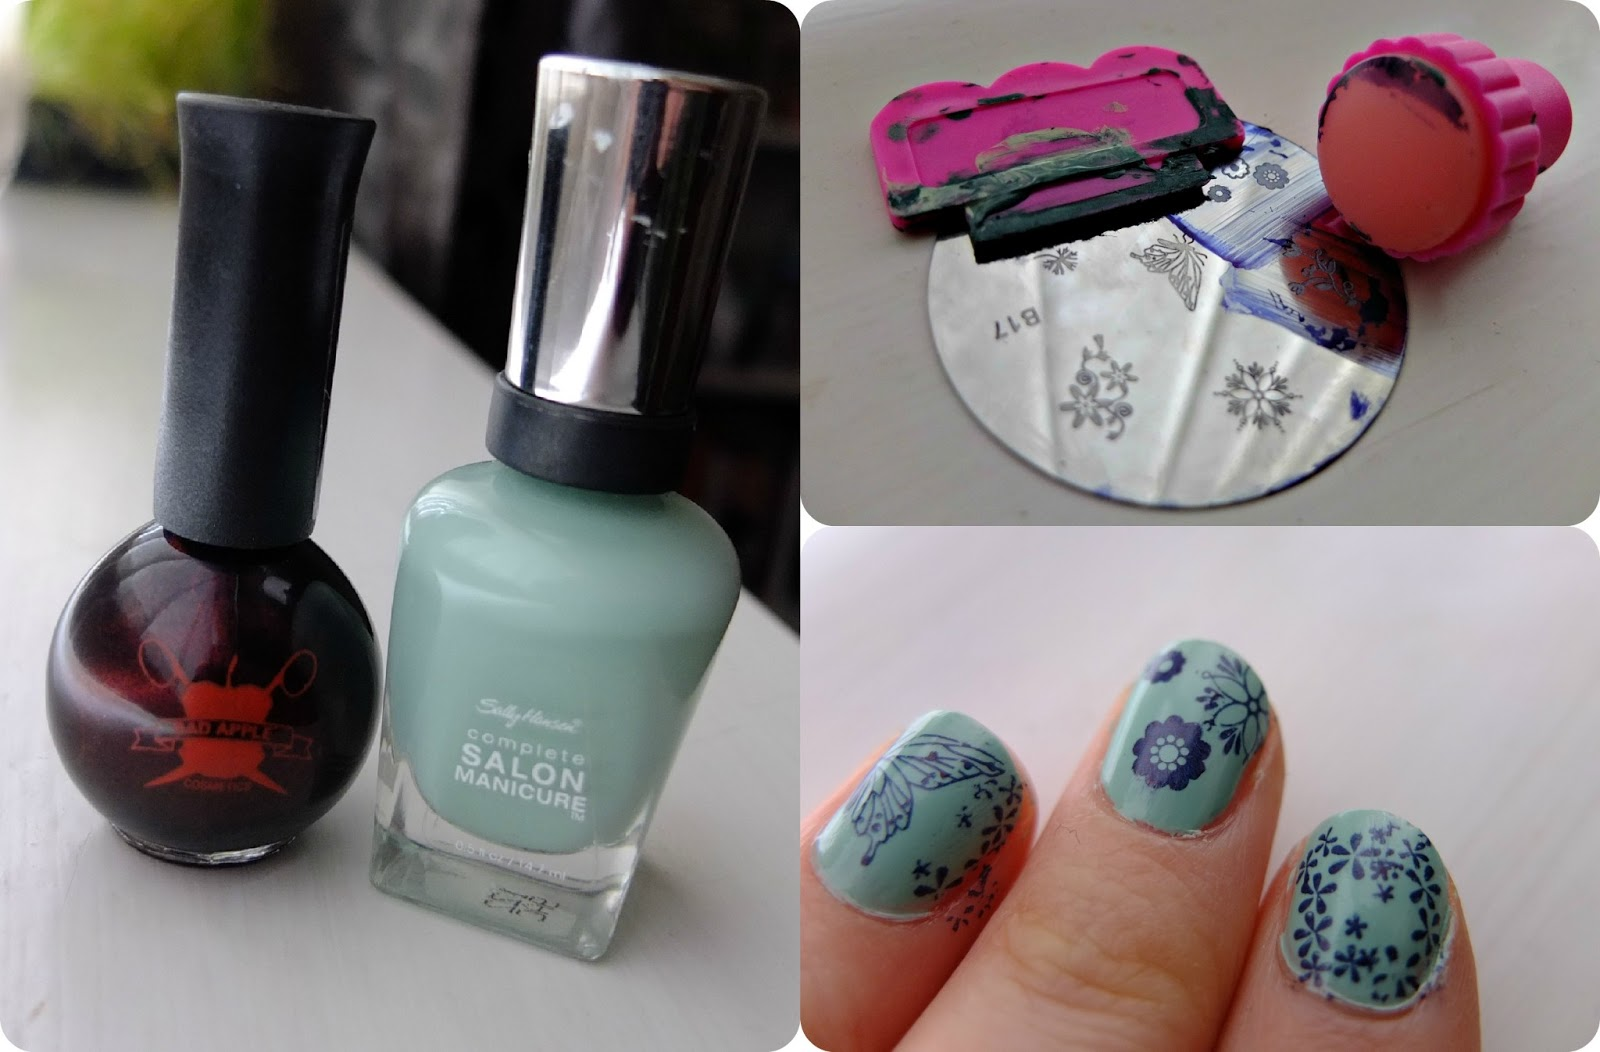 Poundland Nail Art Stamping Kit Hello Terri Lowe